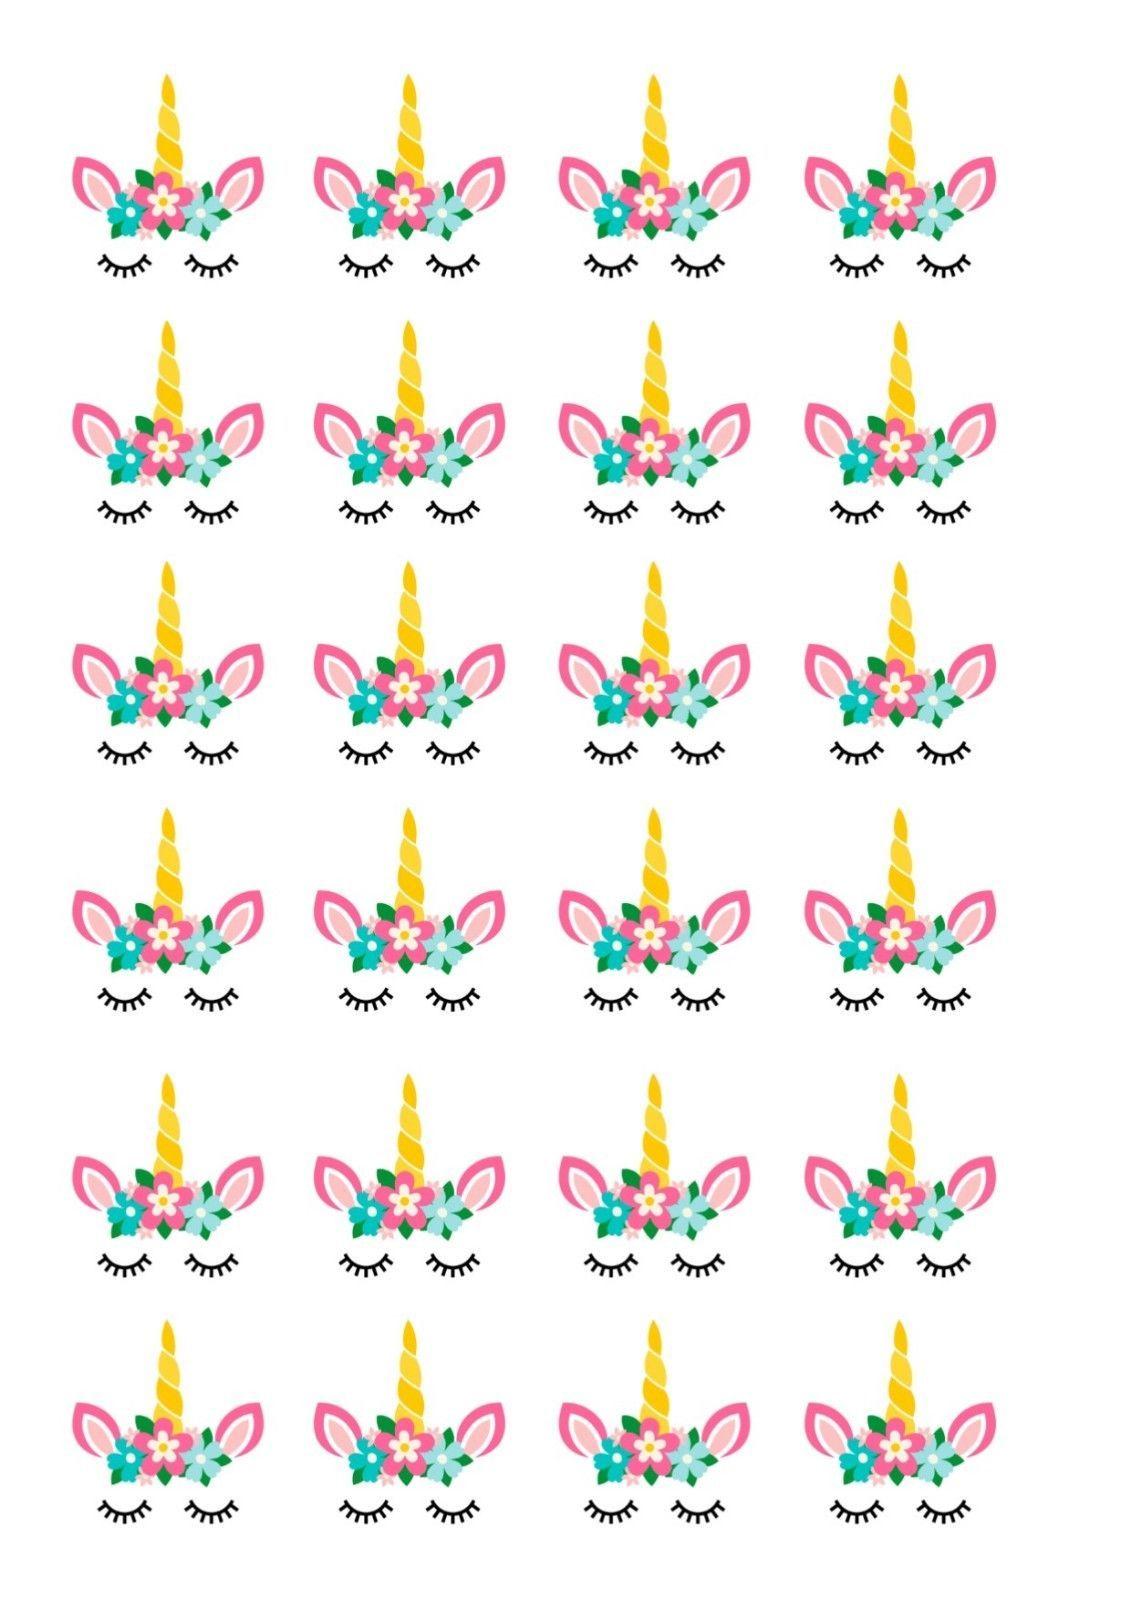 1 99 Gbp 24 Edible Cupcake Fairy Cake Toppers Decorations Unicorn Unicorn Cupcakes Toppers Unicorn Birthday Party Decorations Unicorn Themed Birthday Party